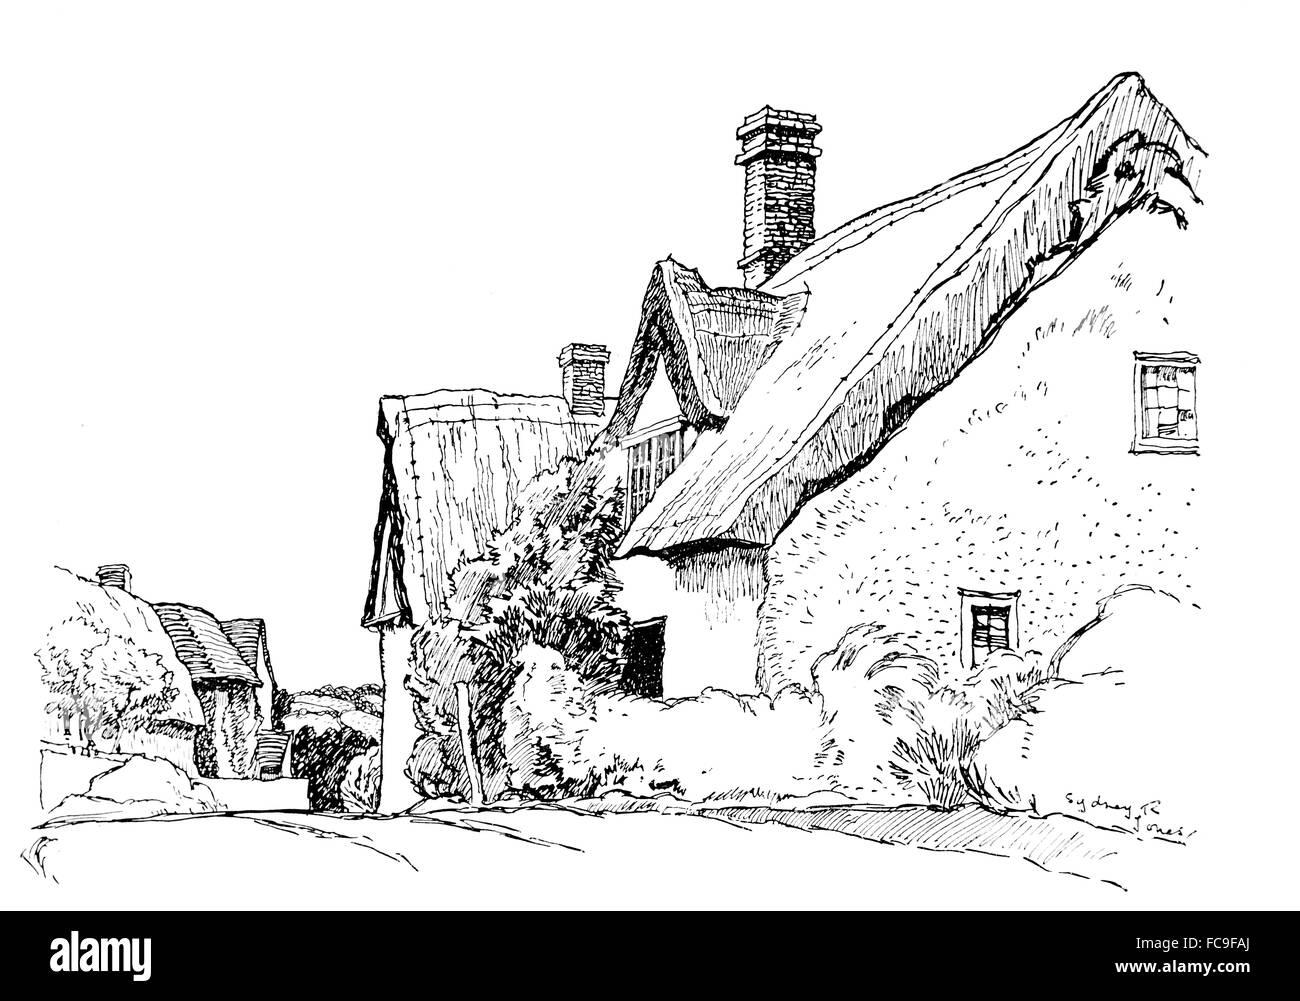 UK, England, Essex, Ashen, old thatched cottage beside road through village, 1911, line illustration by Sydney R - Stock Image